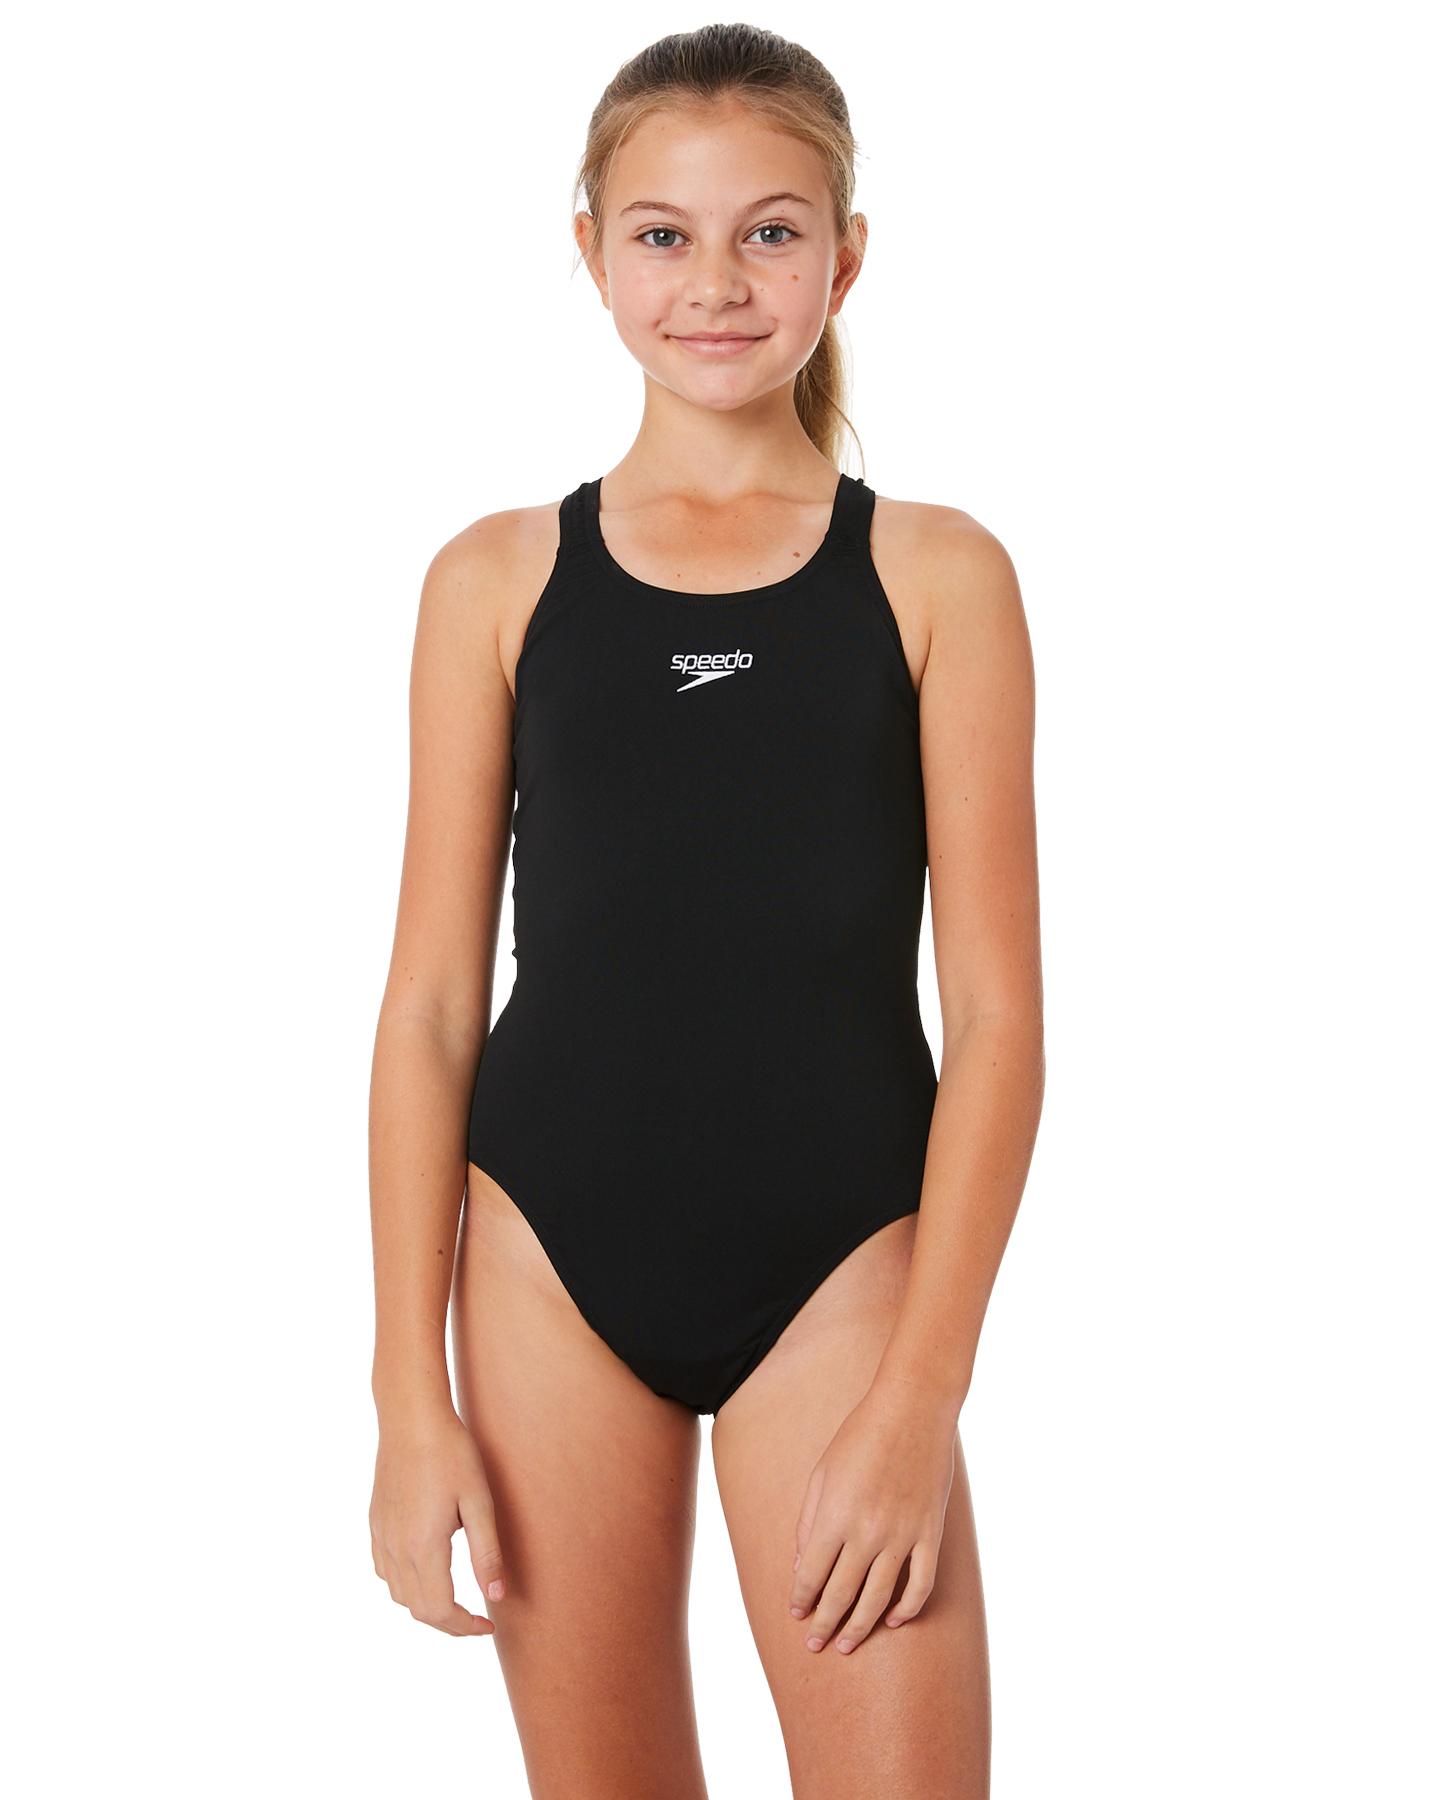 Apologise, but, girl swimsuit speedo swimwear advise